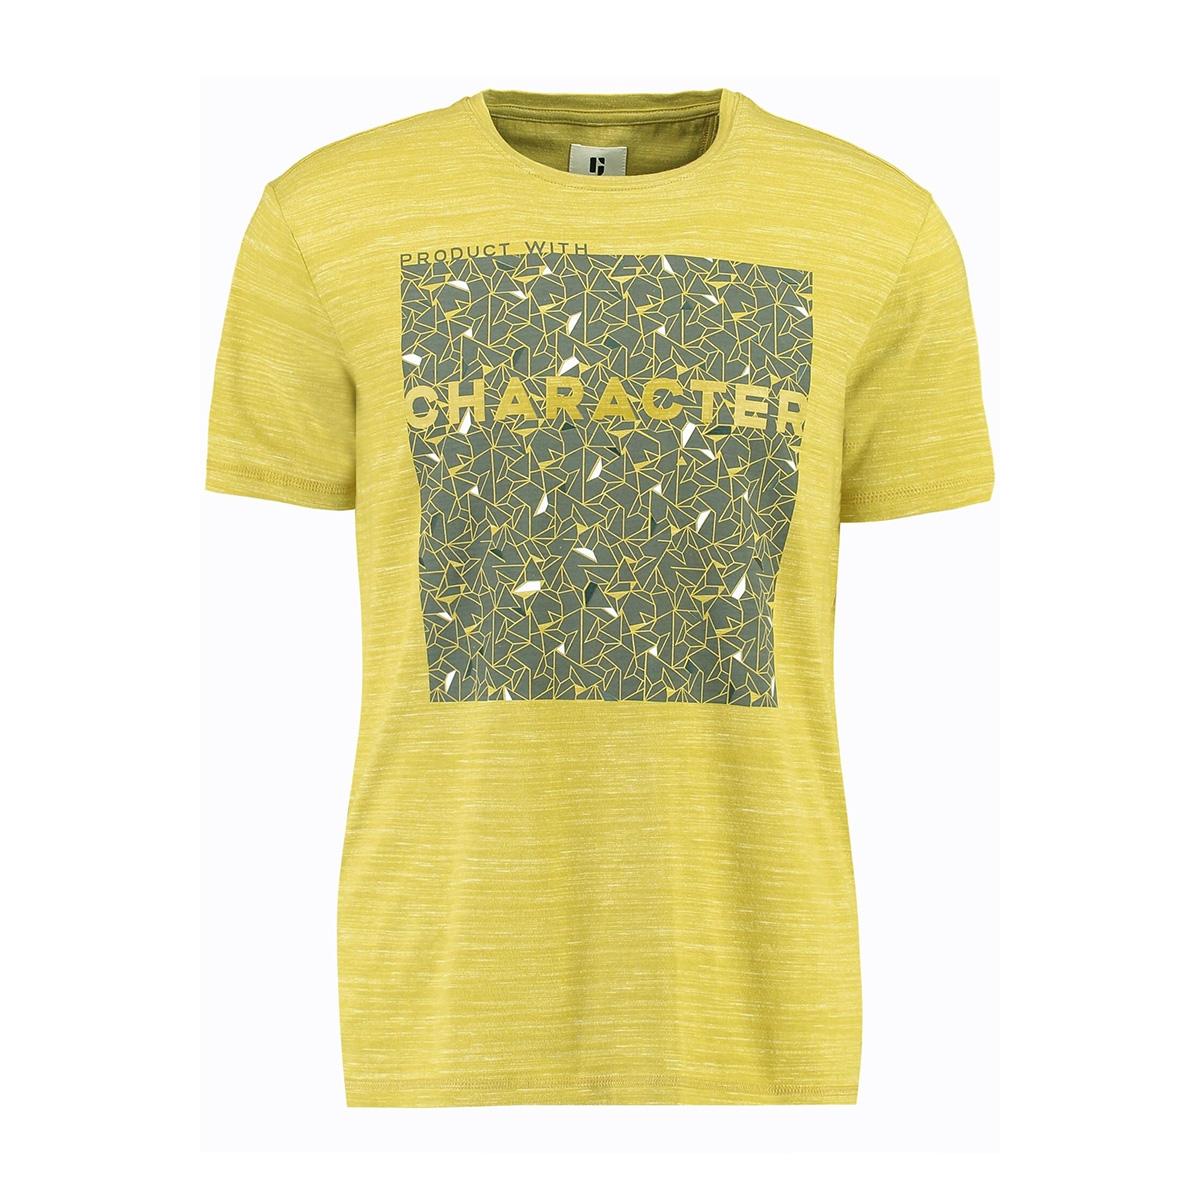 t shirt met print h91208 garcia t-shirt 2911 golden olive